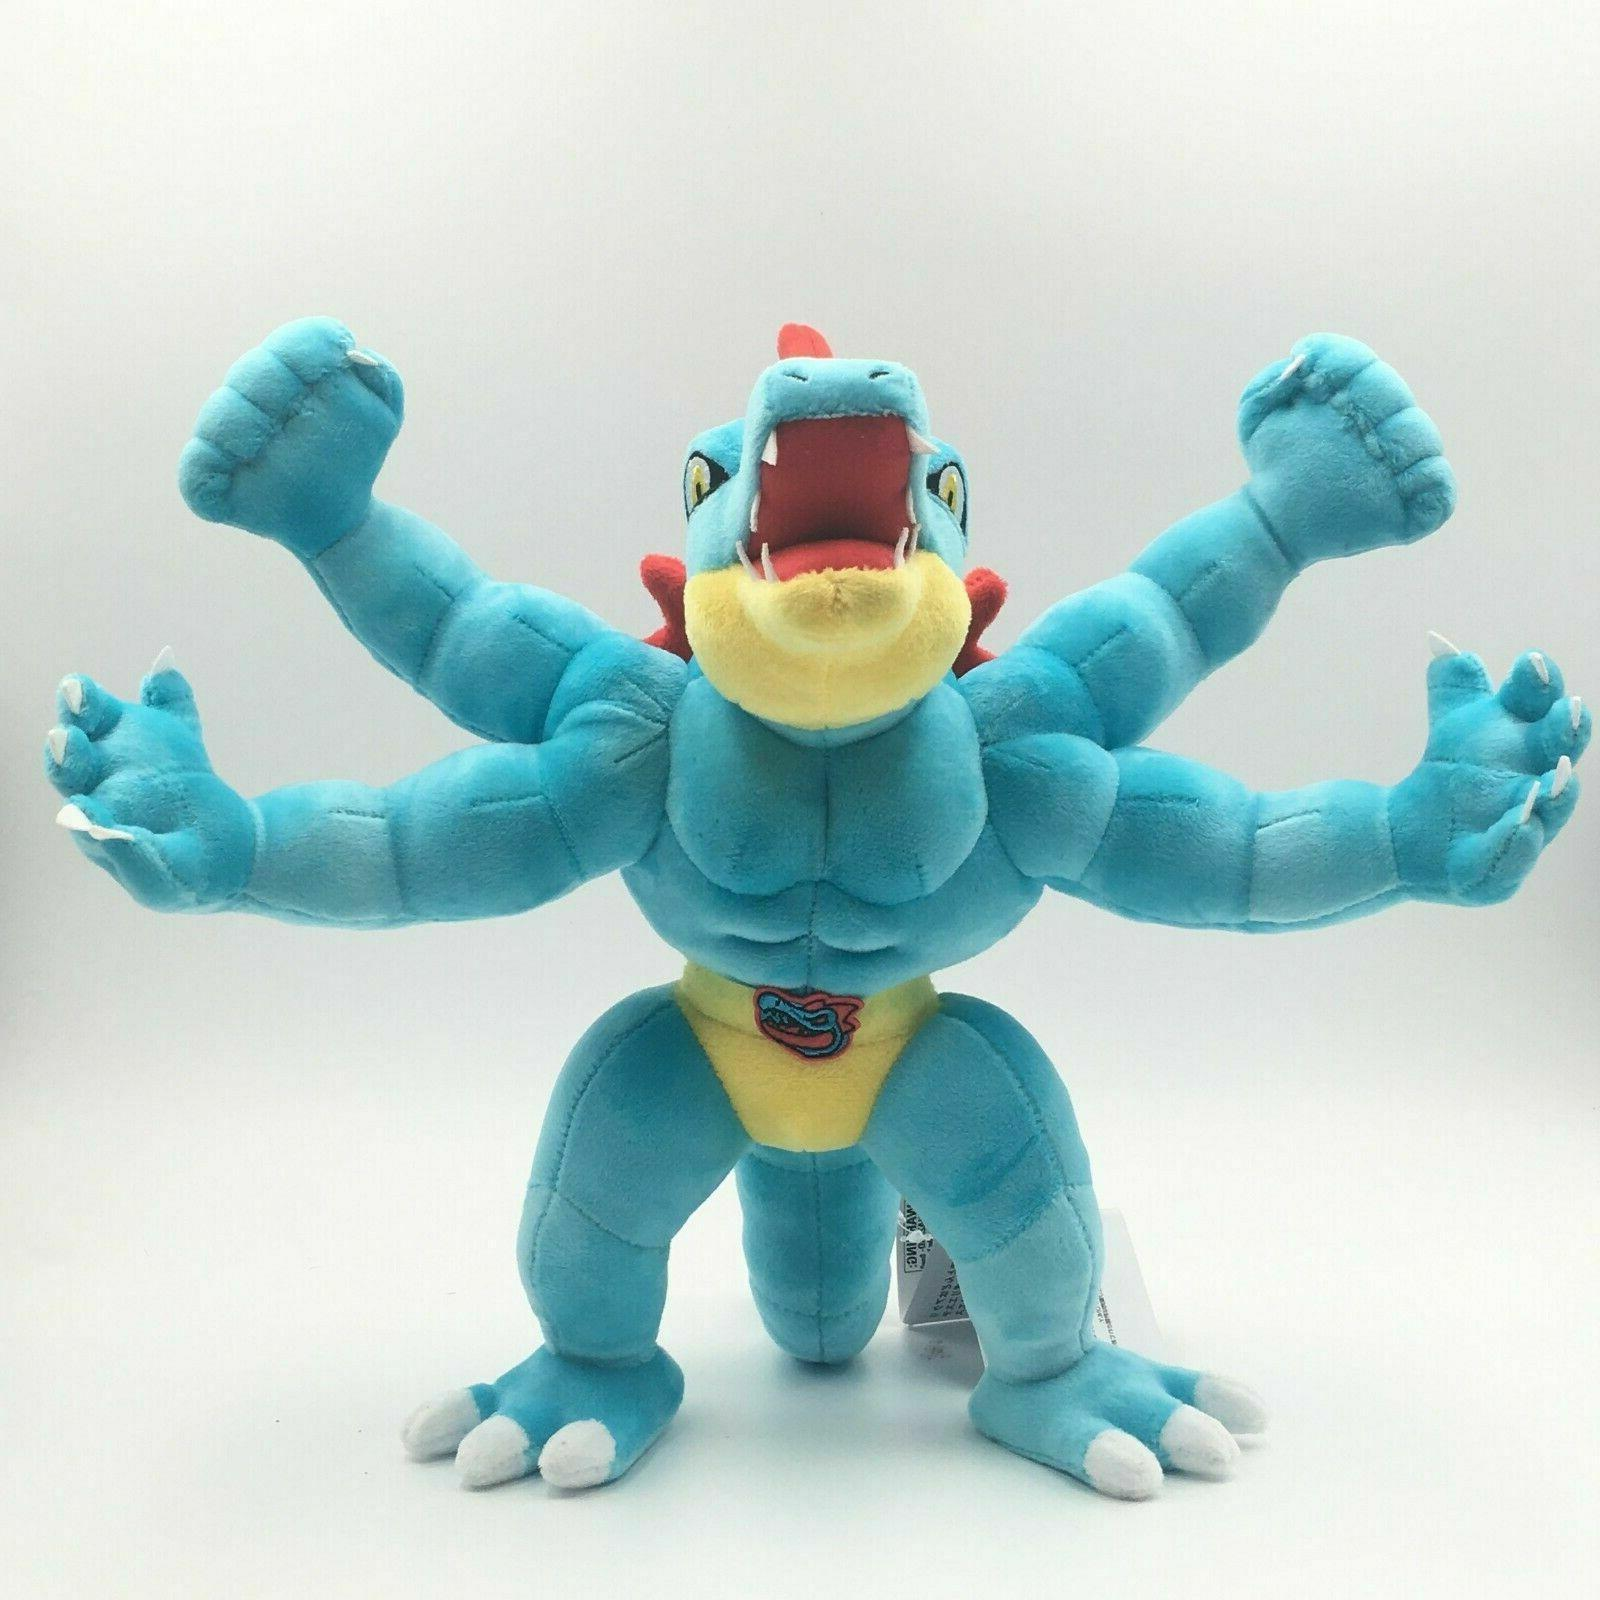 Pokemon Machamp Feraligatr Doll Collection Gift